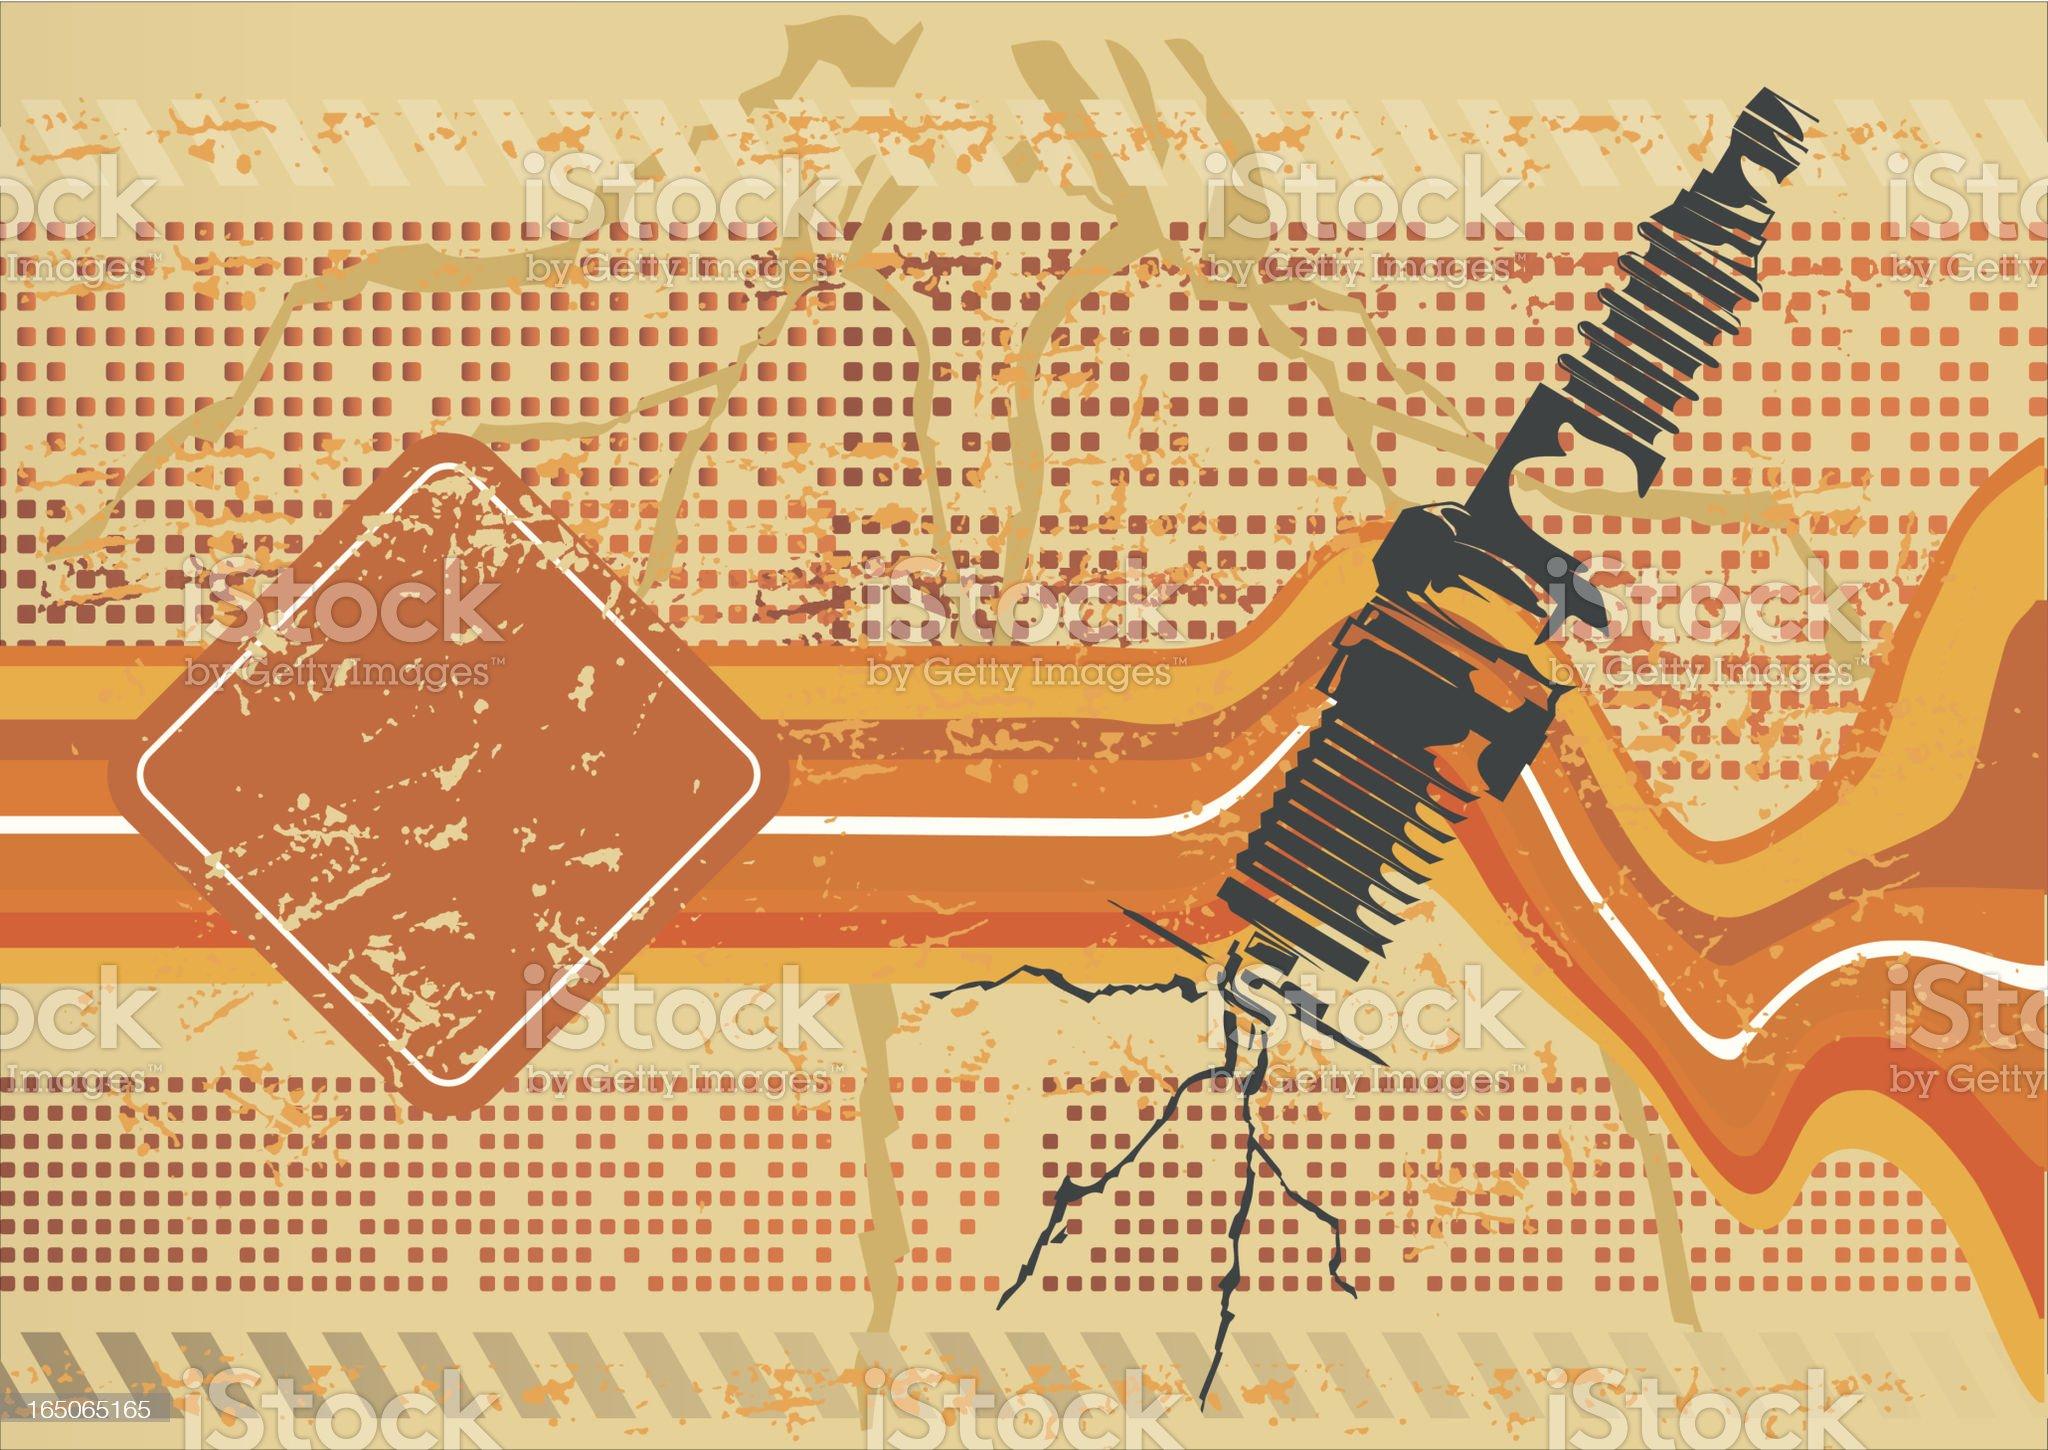 Spark plug - energy stencil royalty-free stock vector art